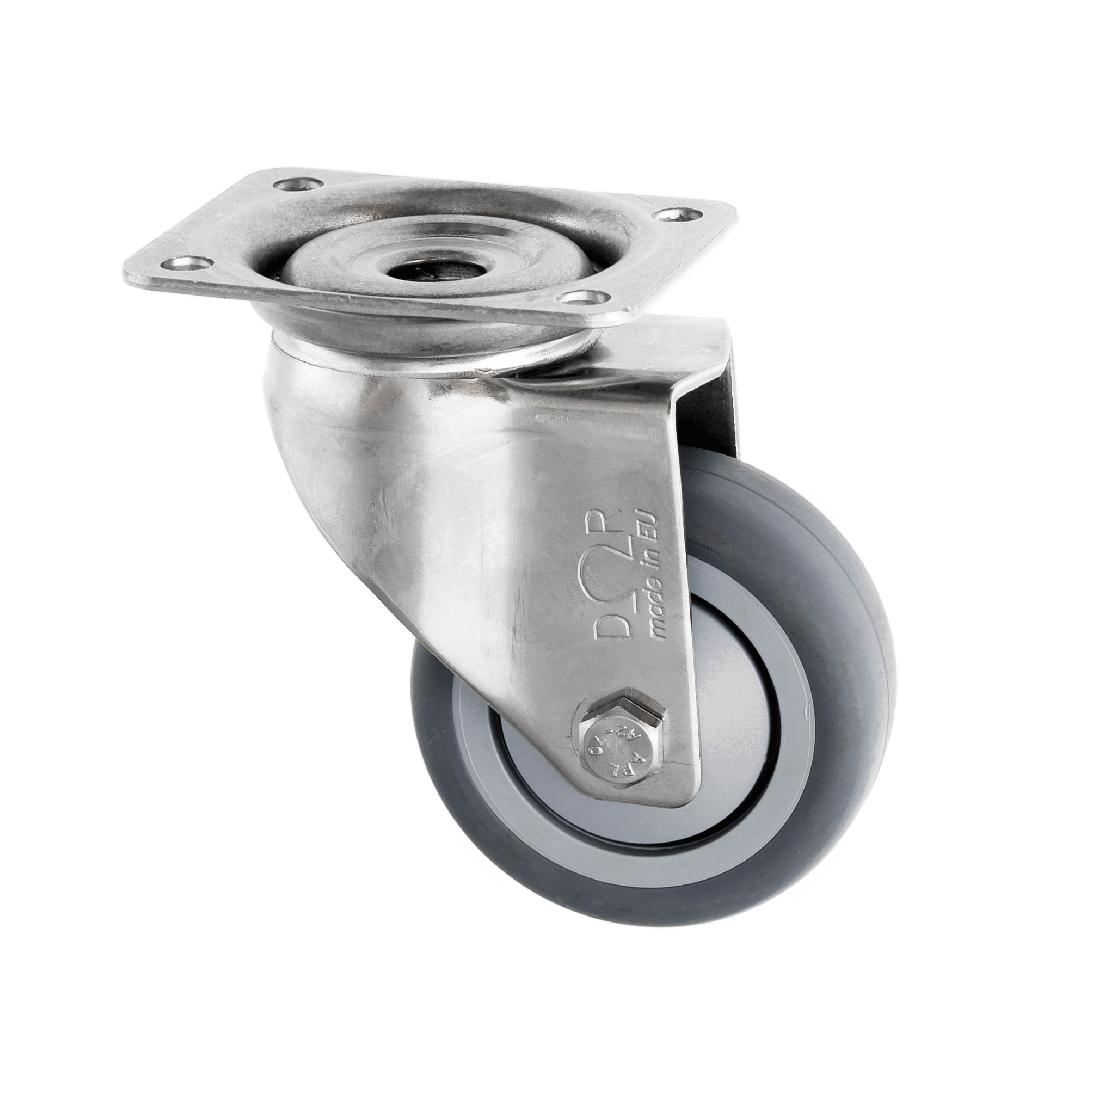 Stainless Steel Castors Series SSL Light Duty Thermoplastic Rubber Wheel